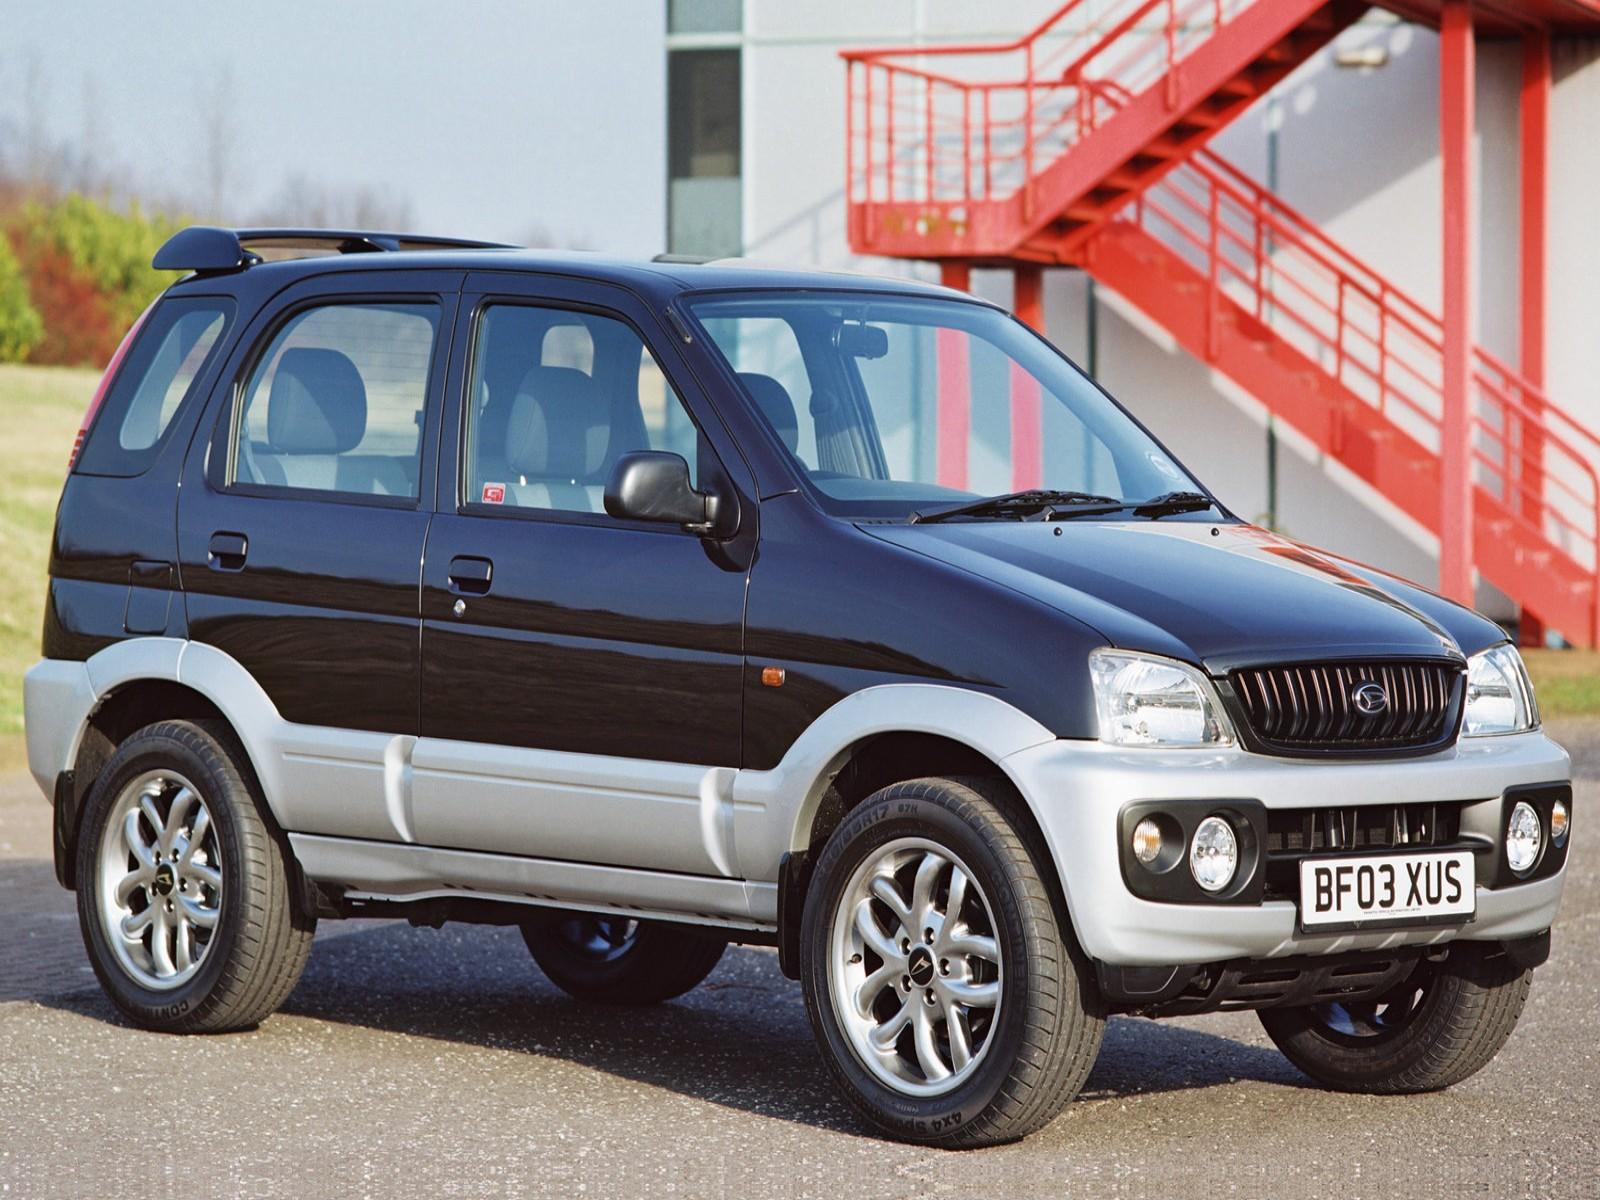 Car And Car Zone: Daihatsu Terios Sport 2003 New Cars, Car